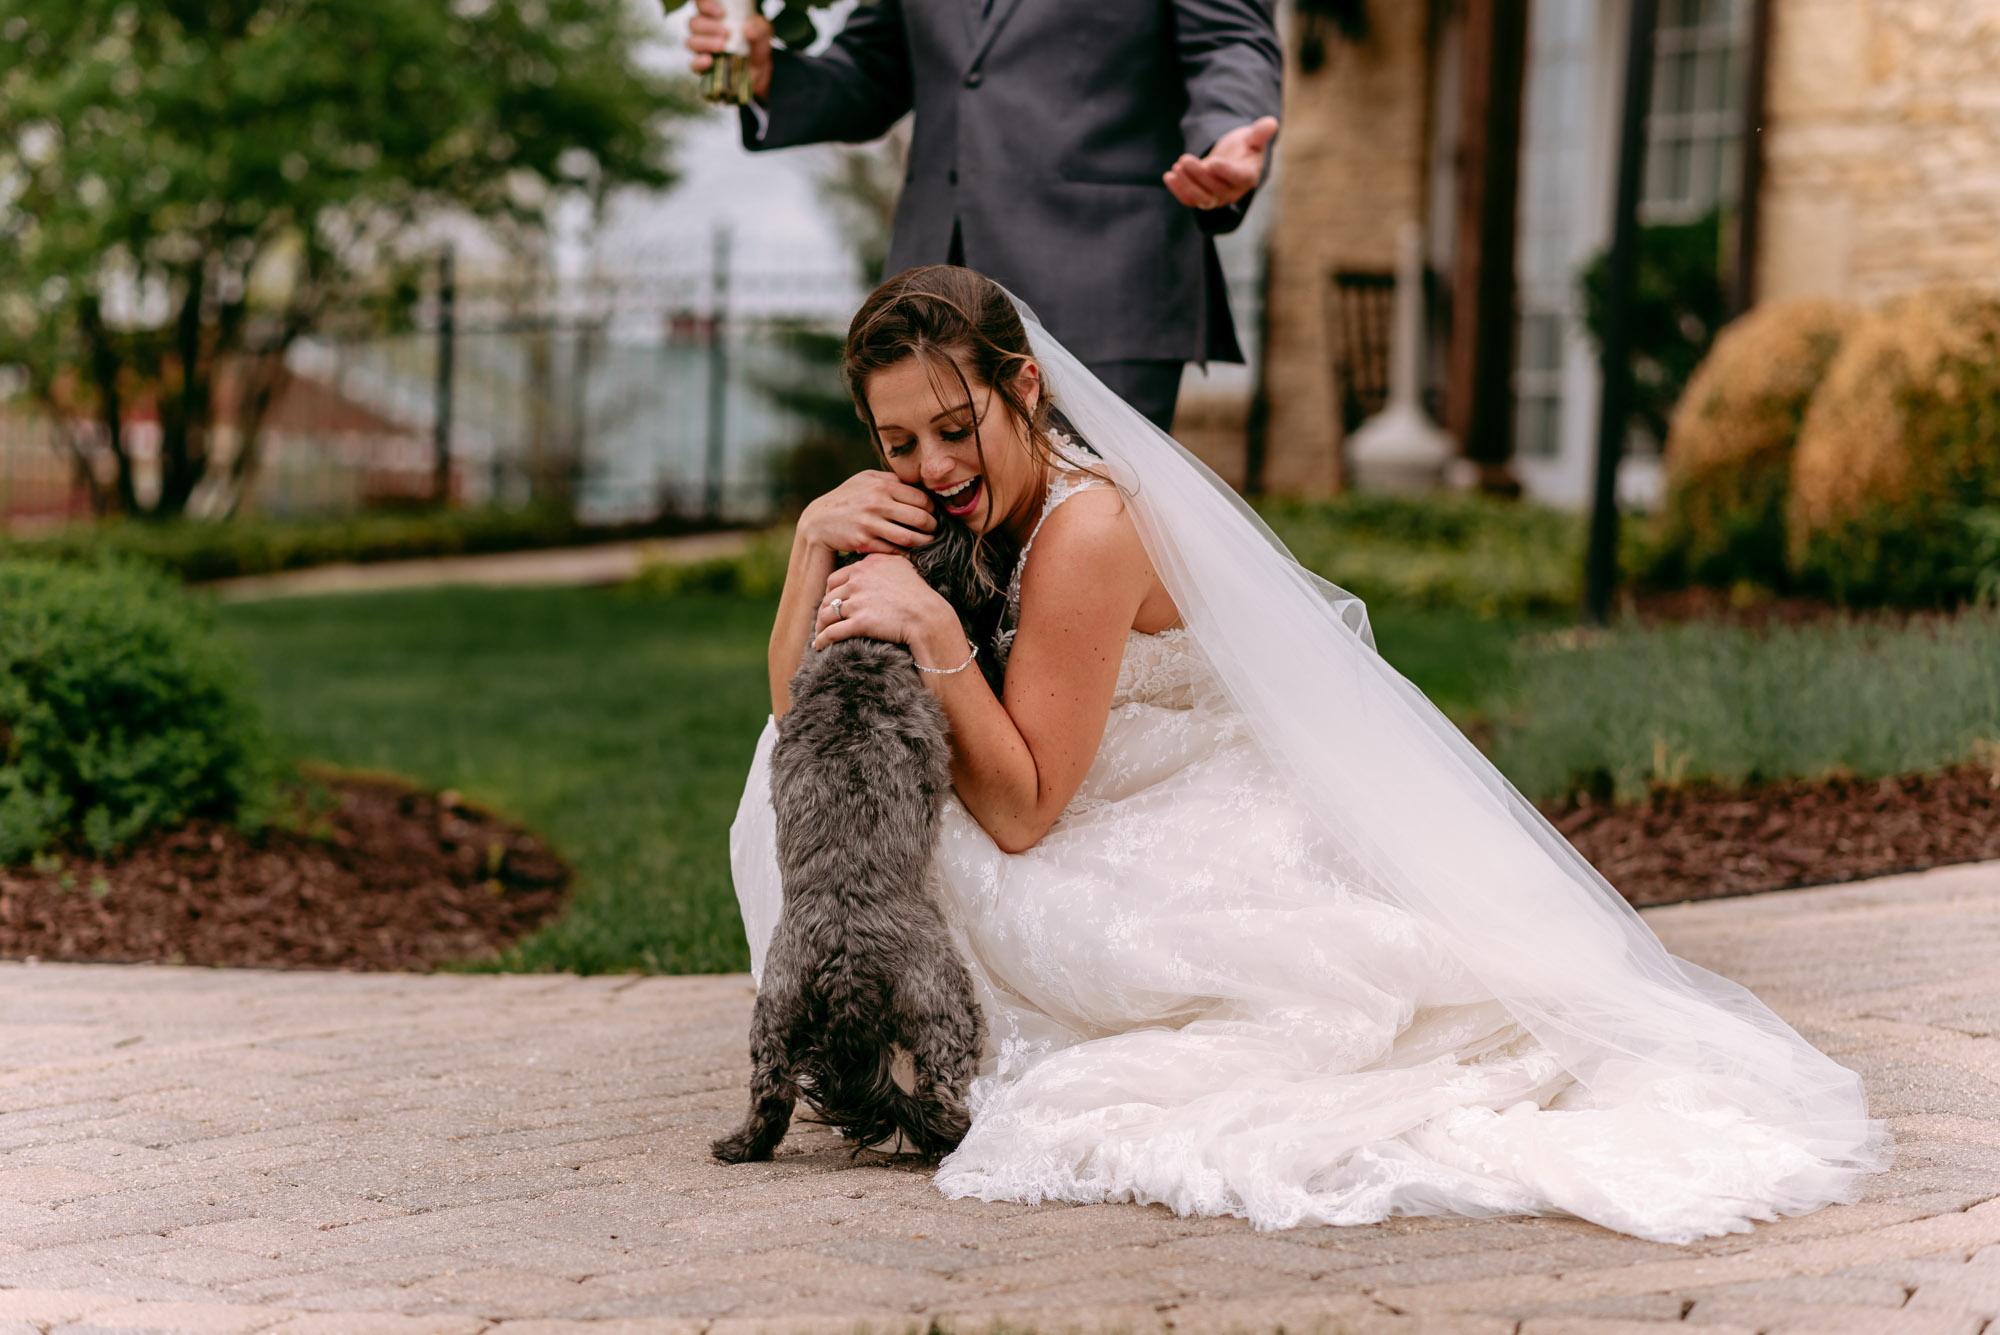 orchard-farms-pavillion-wedding-rockton-IL-wedding-photographers-216.jpg